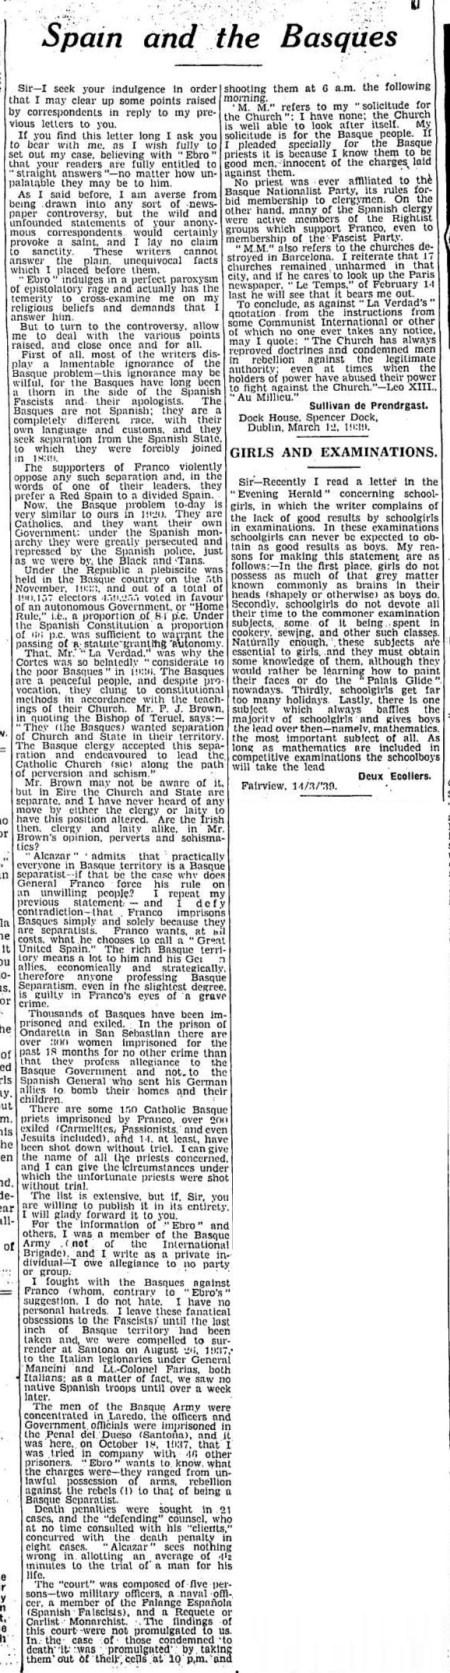 Evening Herald 1939-03-16 p4